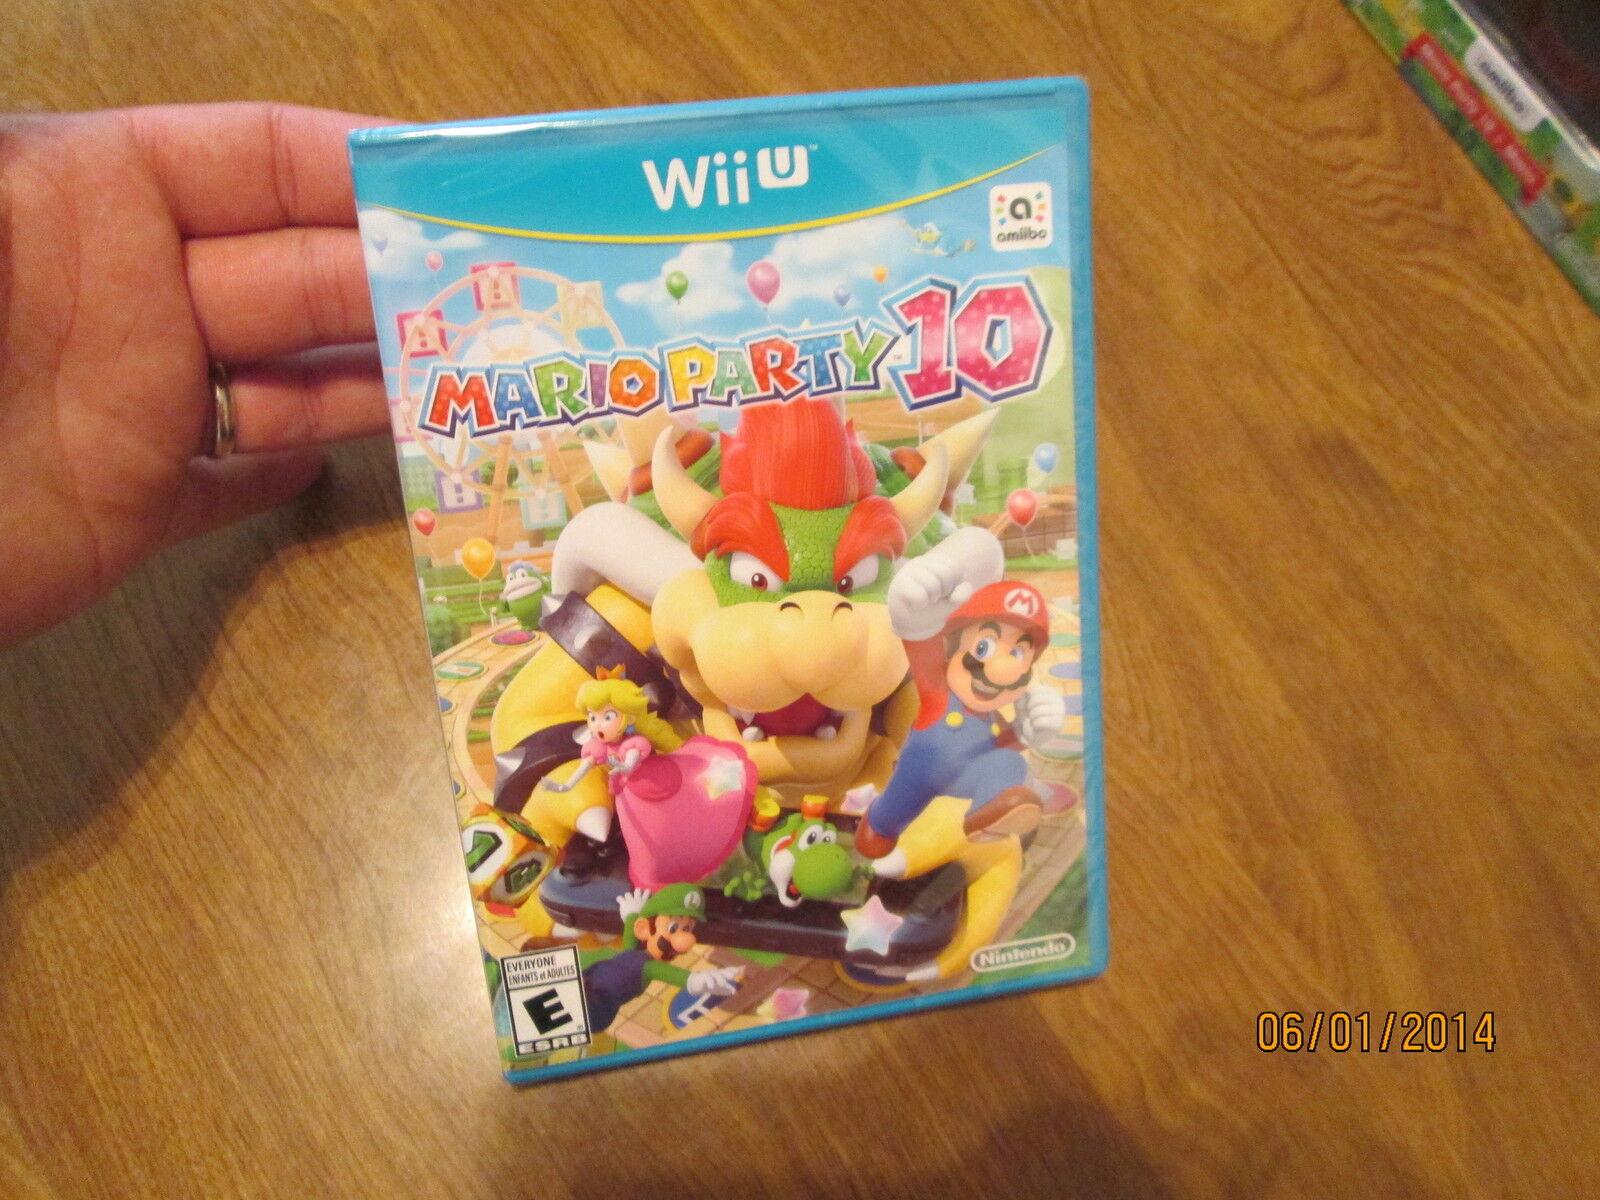 Mario Party 10 Nintendo Wii U FIRST PRINT BLUE CASE